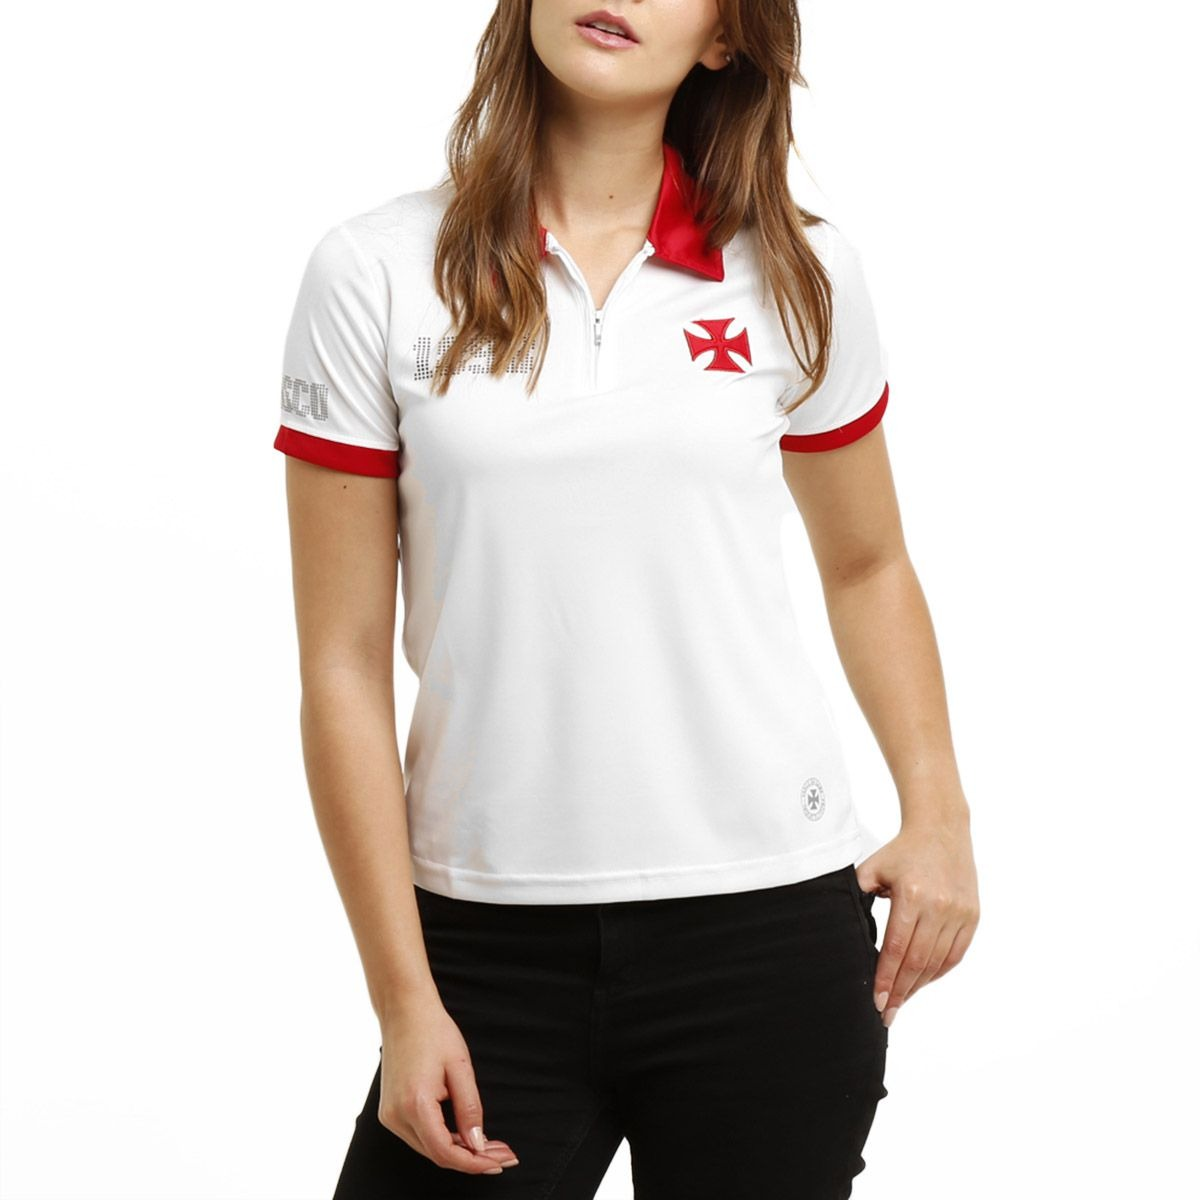 0b8893339b775 Kit C  6 Camisas Polo Femininas Vasco Dry Soft Oficial + Nf - R  149 ...